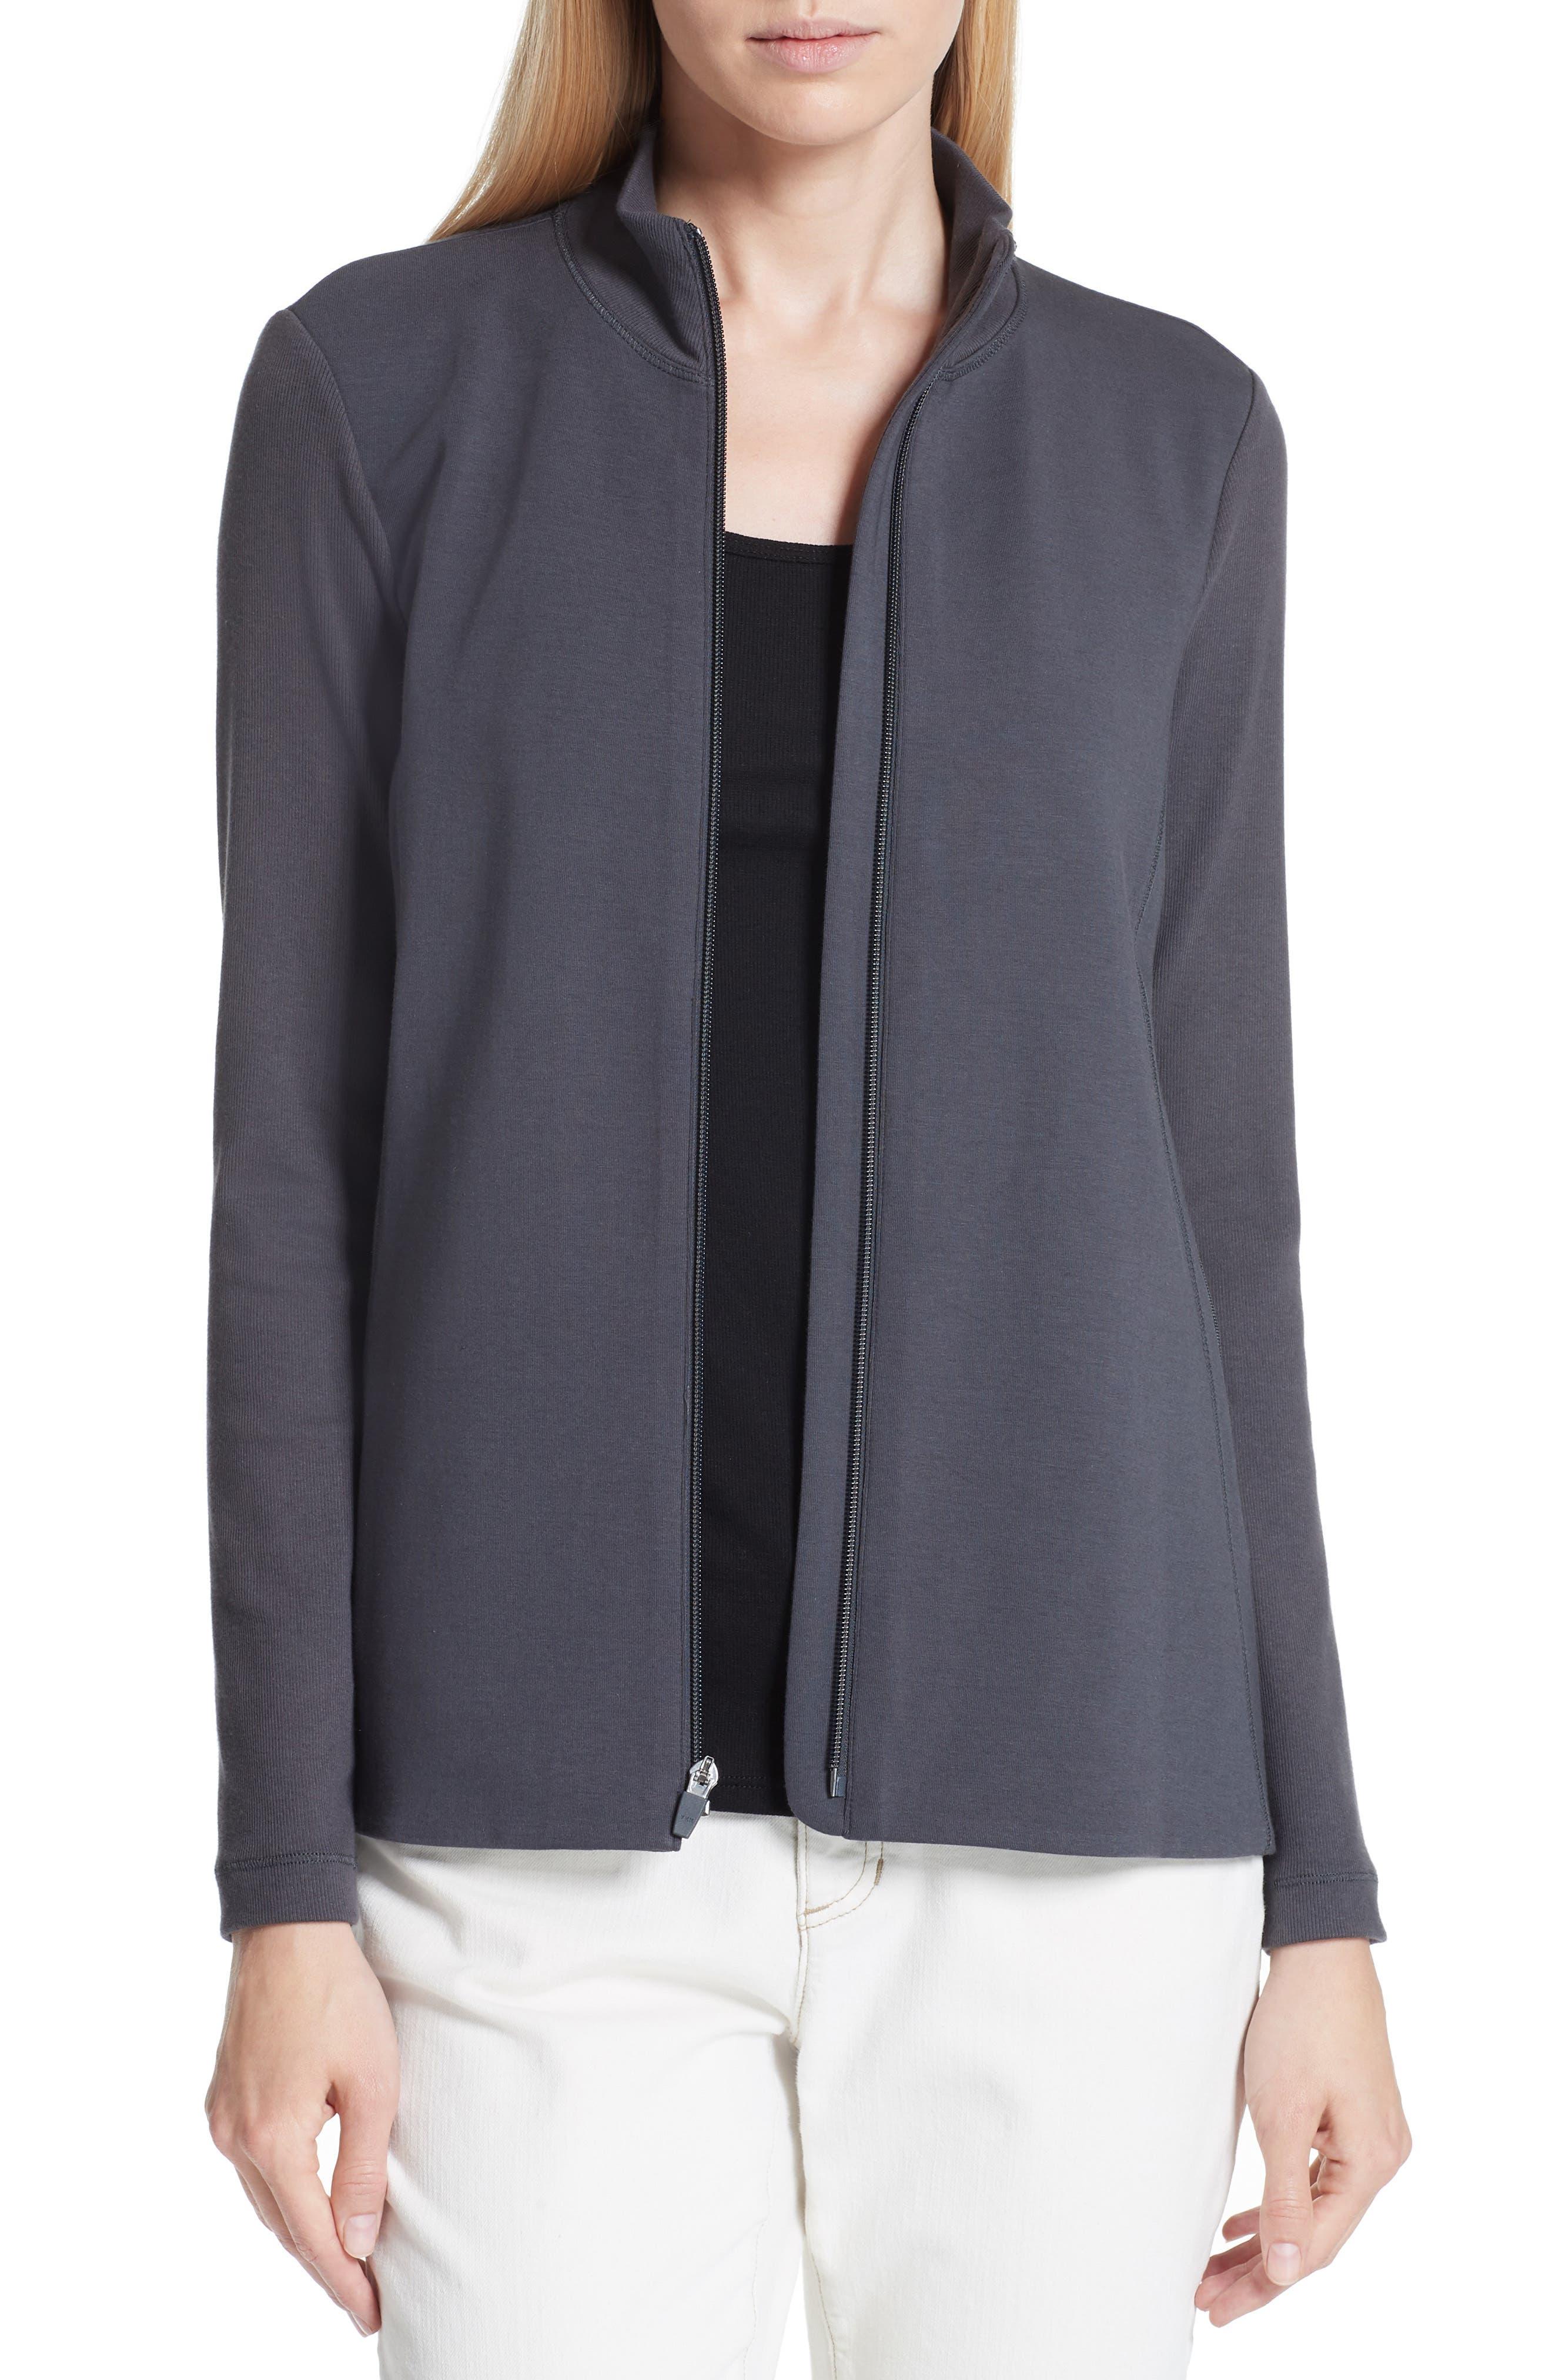 Mixed Organic Cotton Stretch Knit Jacket,                             Main thumbnail 1, color,                             Graphite